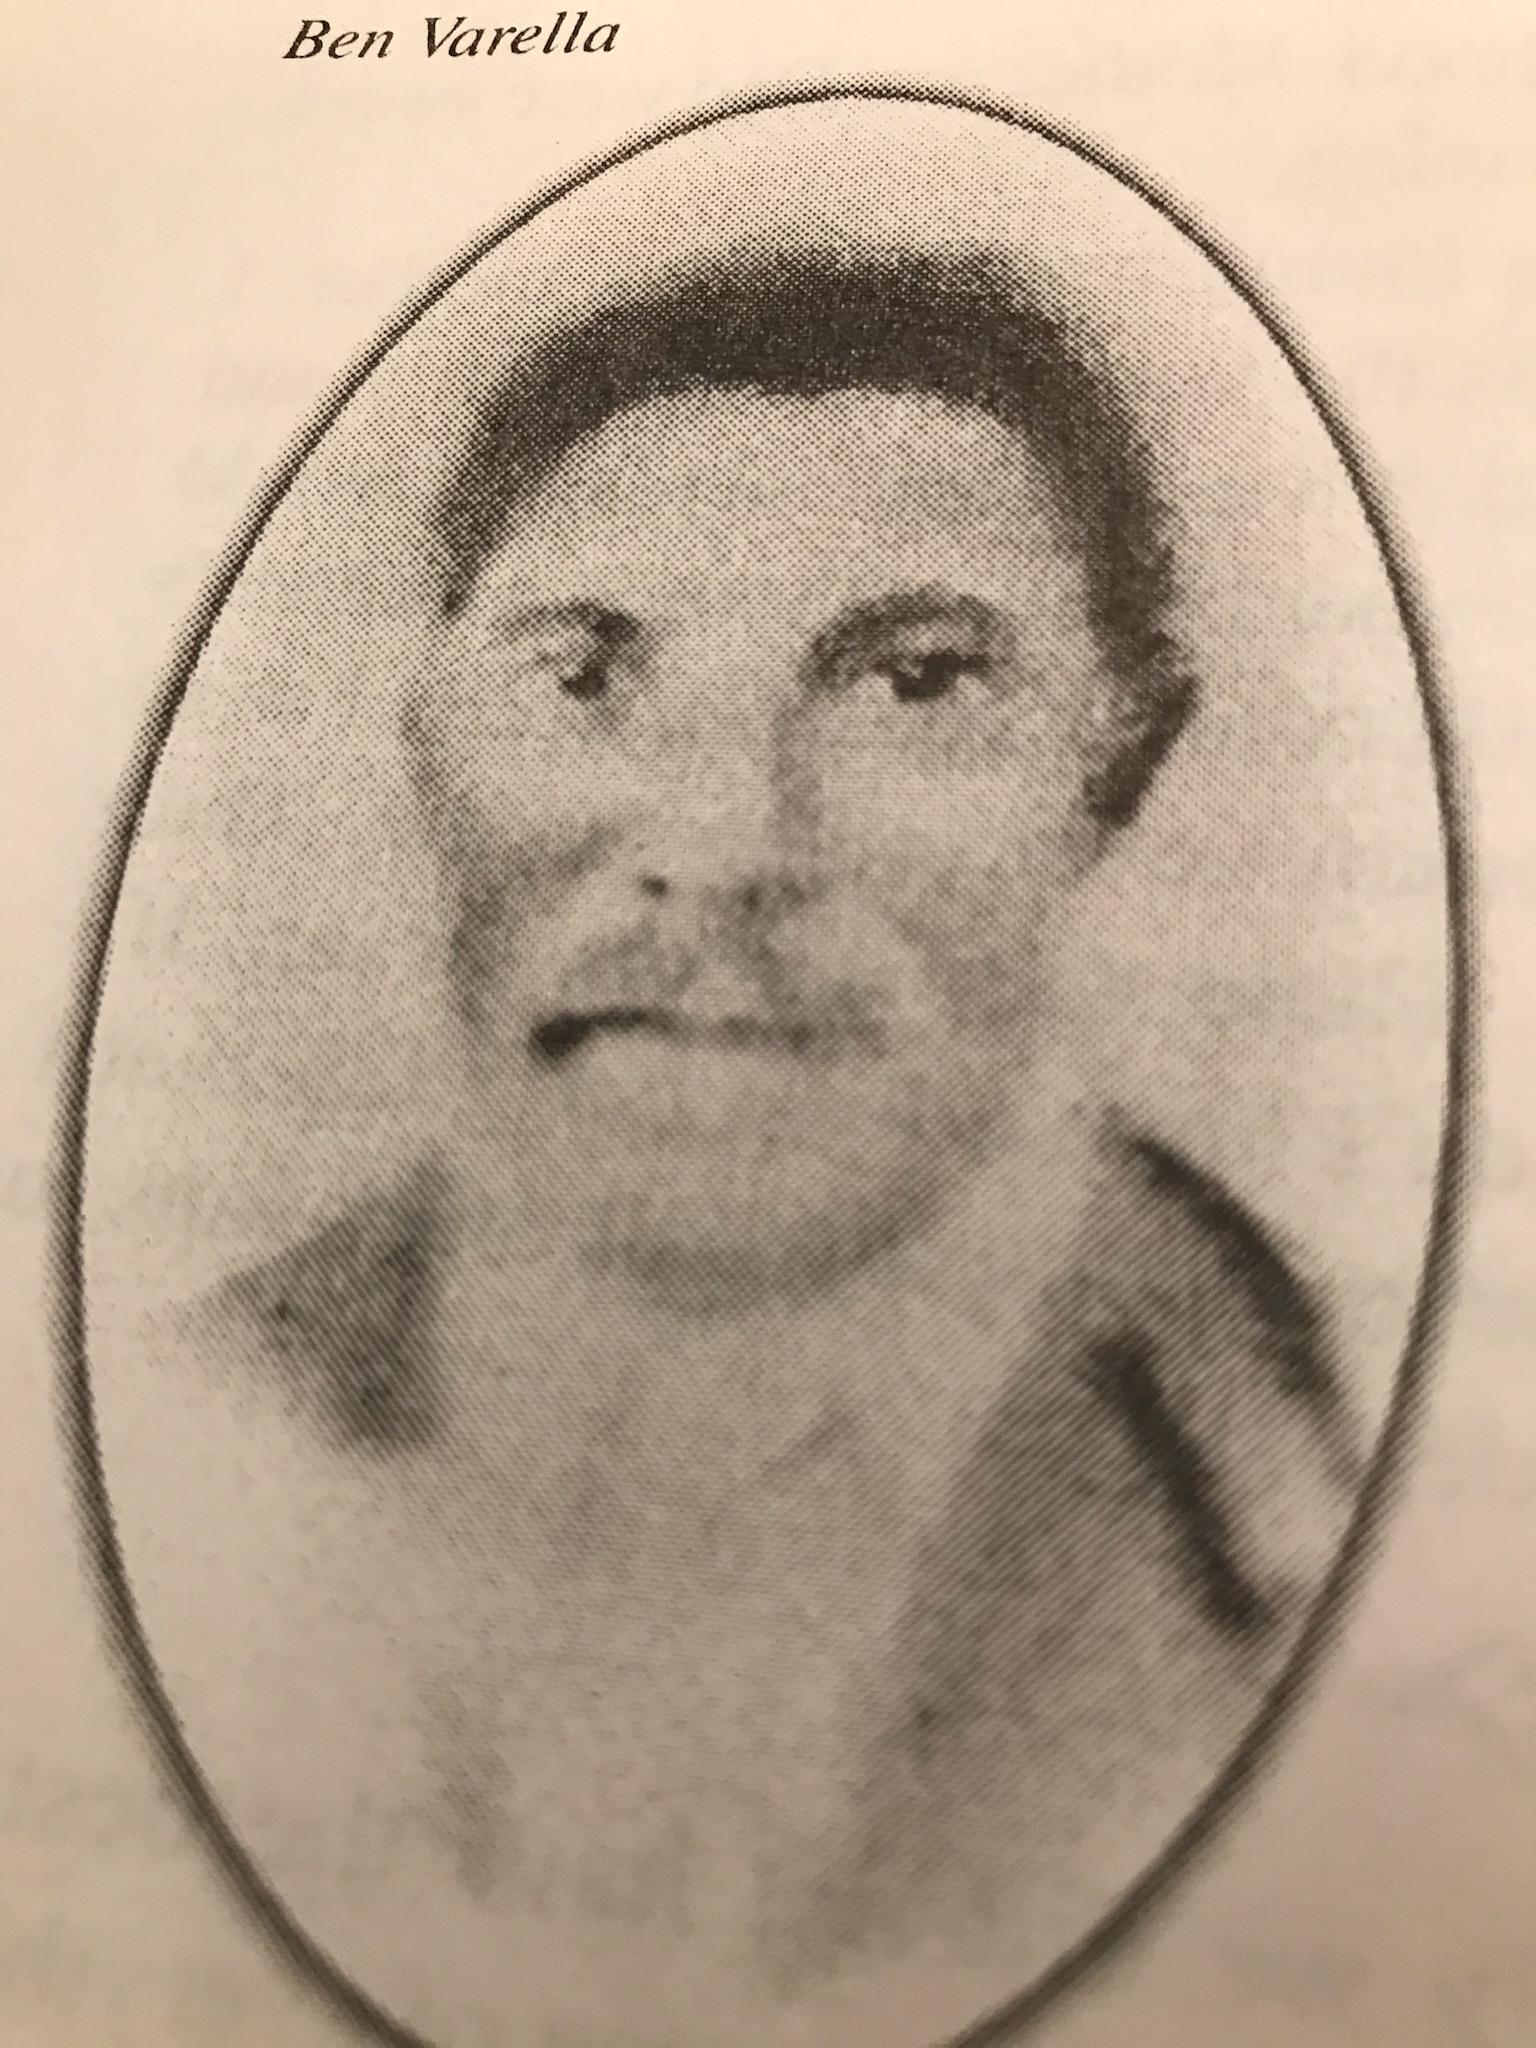 Julius Britto's Great Grandfather Bernardino Horta Varella